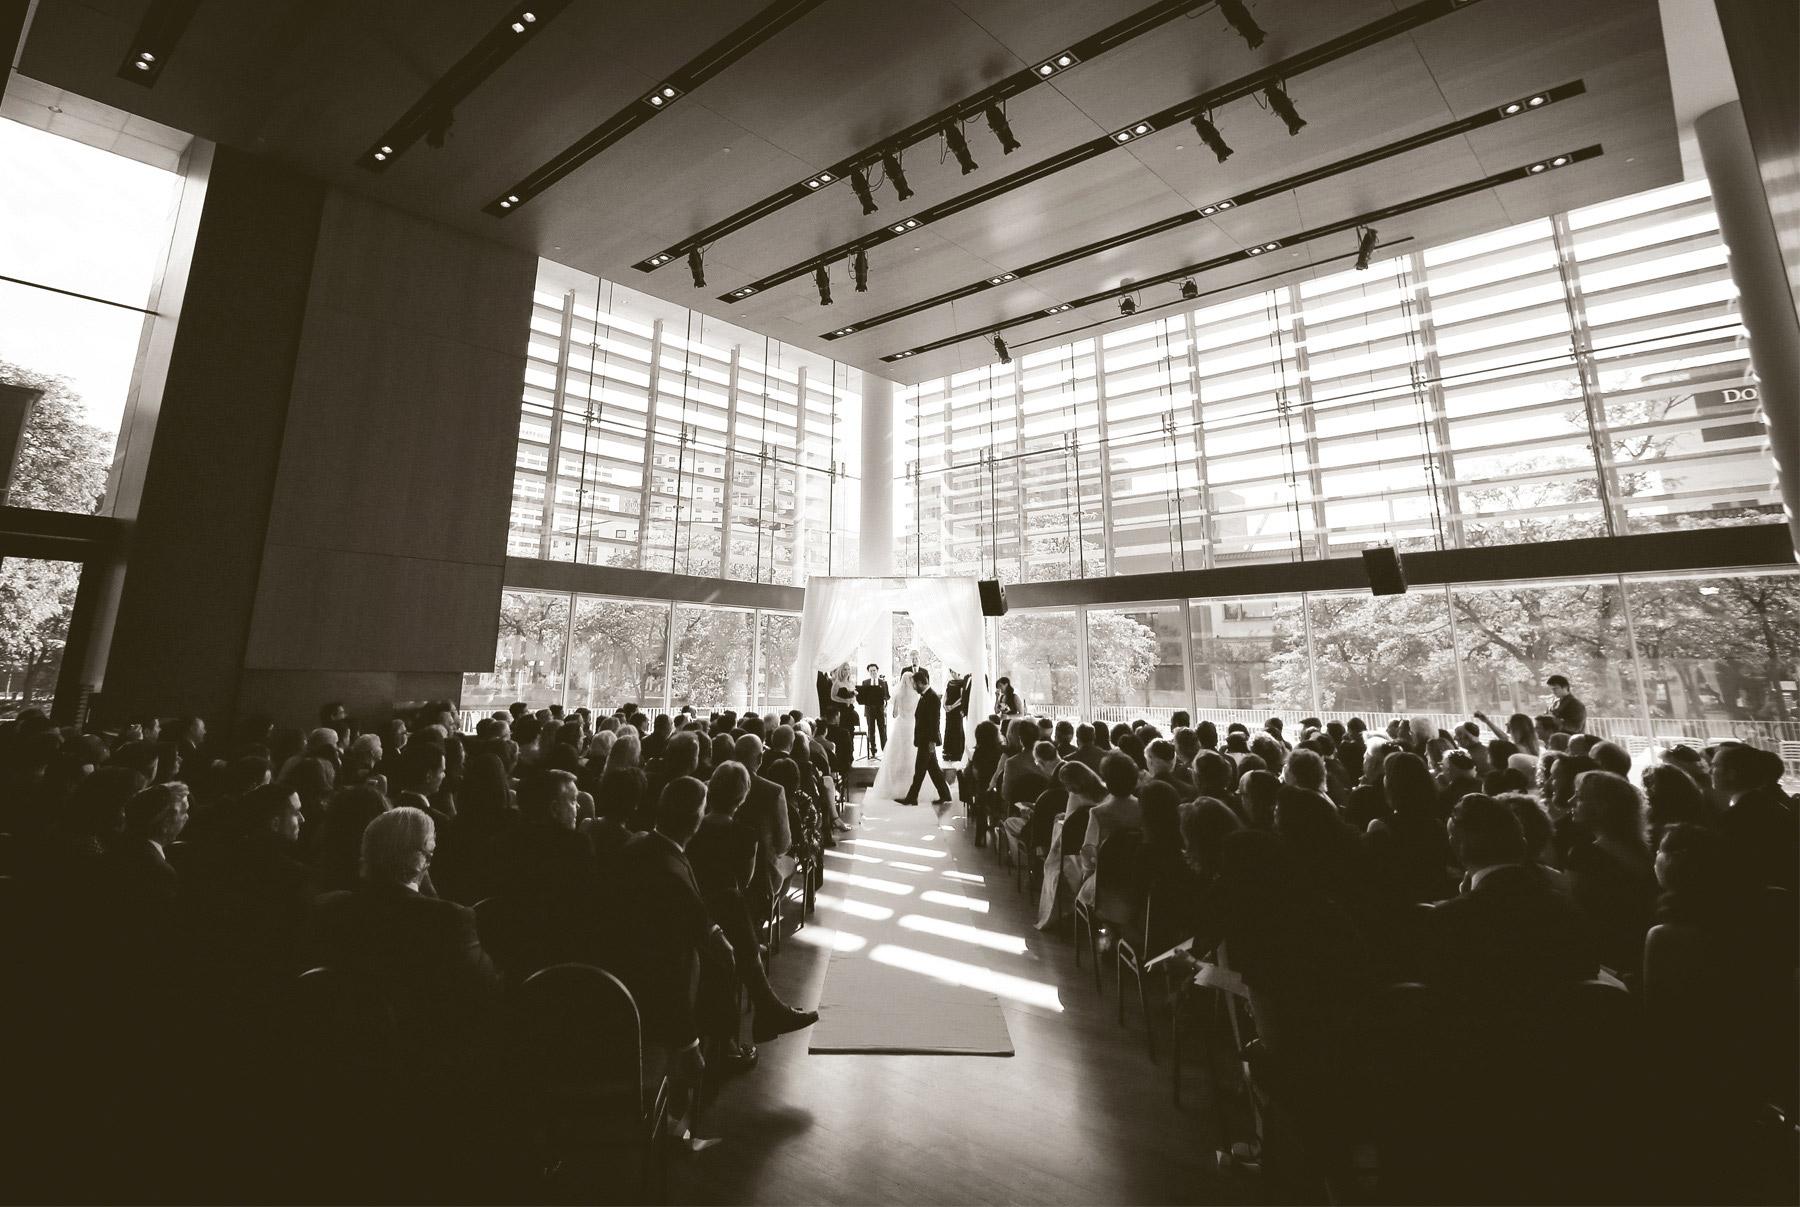 10-Minneapolis-Minnesota-Wedding-Photography-by-Vick-Photography-Hilton-Downtown-Ceremony-Lisa-and-Jared.jpg